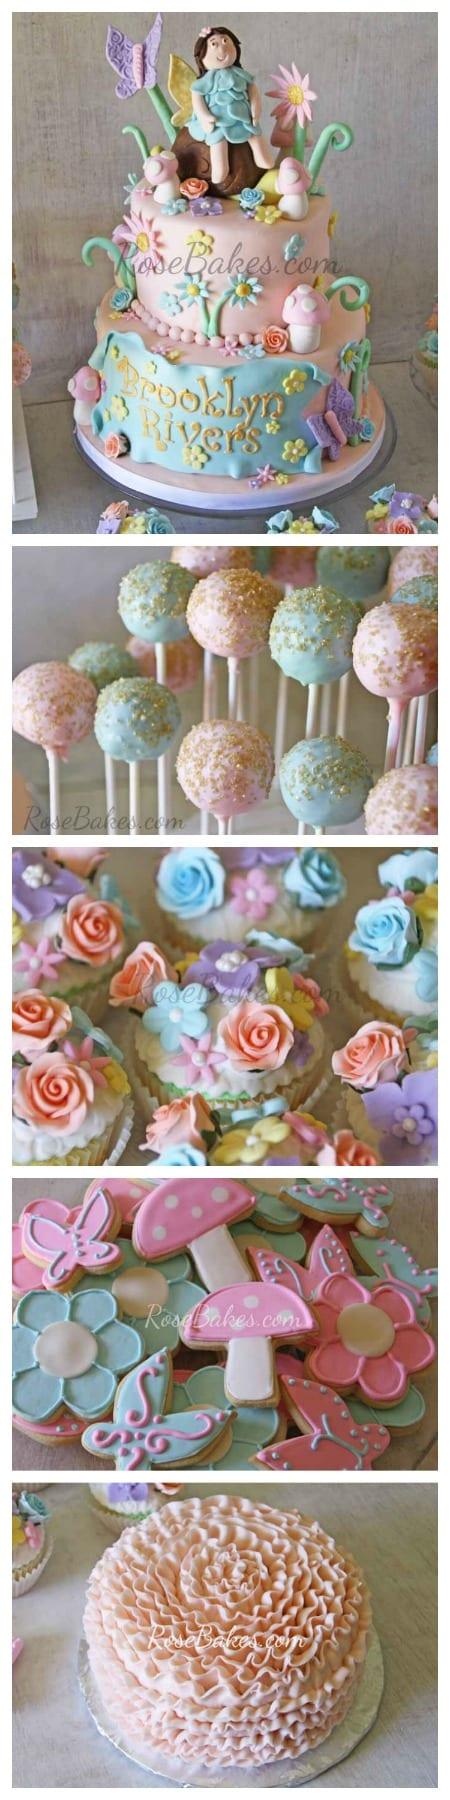 Vintage Fairy Garden Party RoseBakes.com